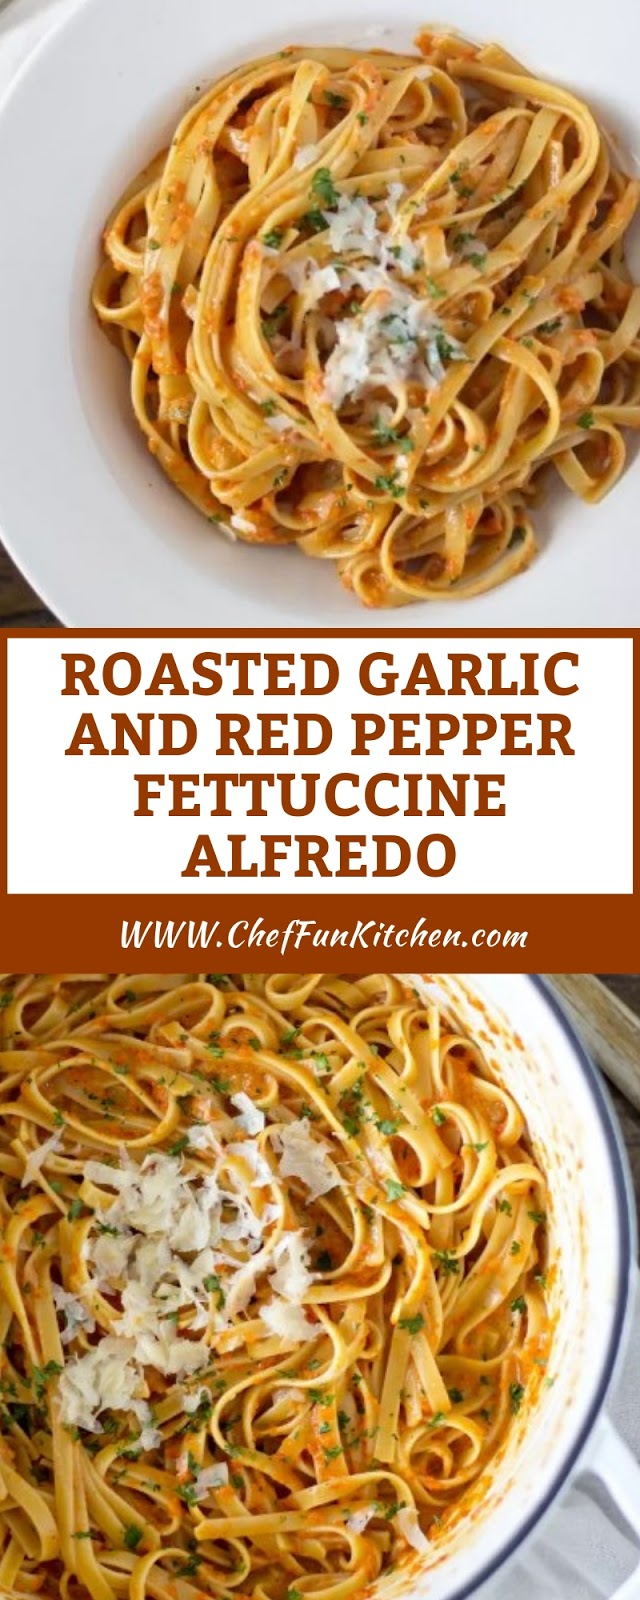 ROASTED GARLIC AND RED PEPPER FETTUCCINE ALFREDO